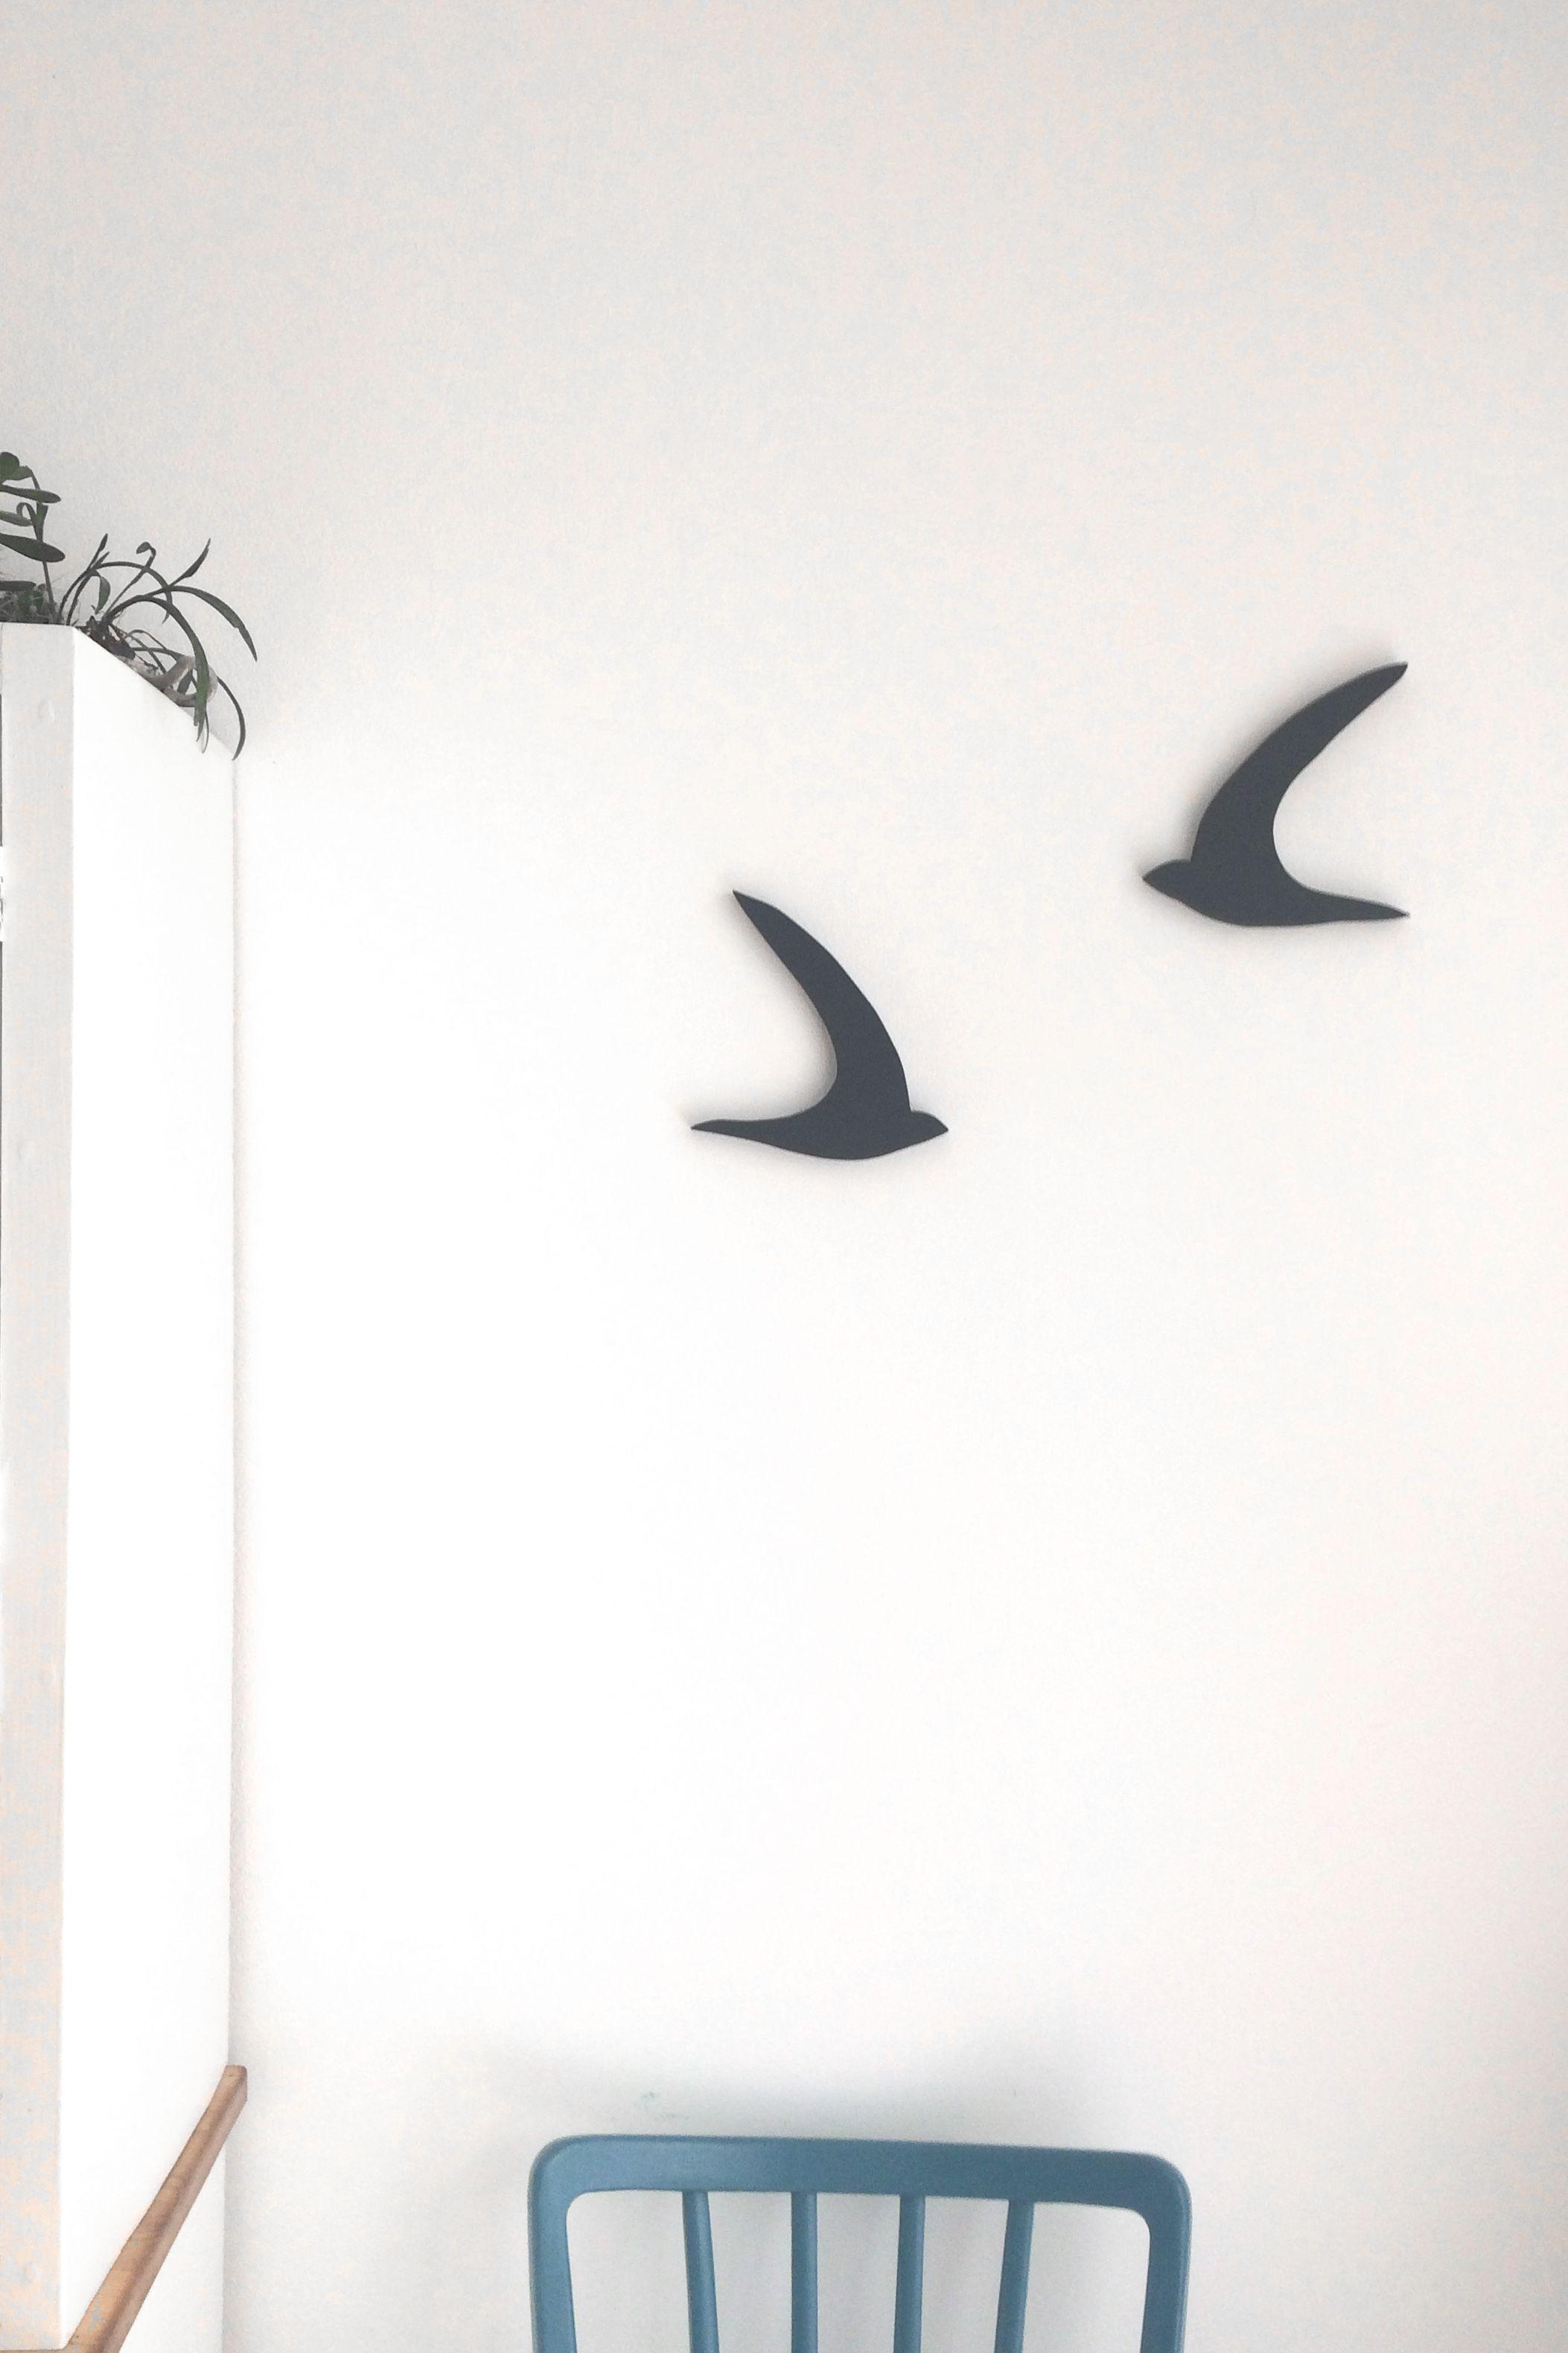 Flying Bird Wall Decor Made Of Wood Flying Birds Wall Decor Dyi Wall Art Bird Wall Decor